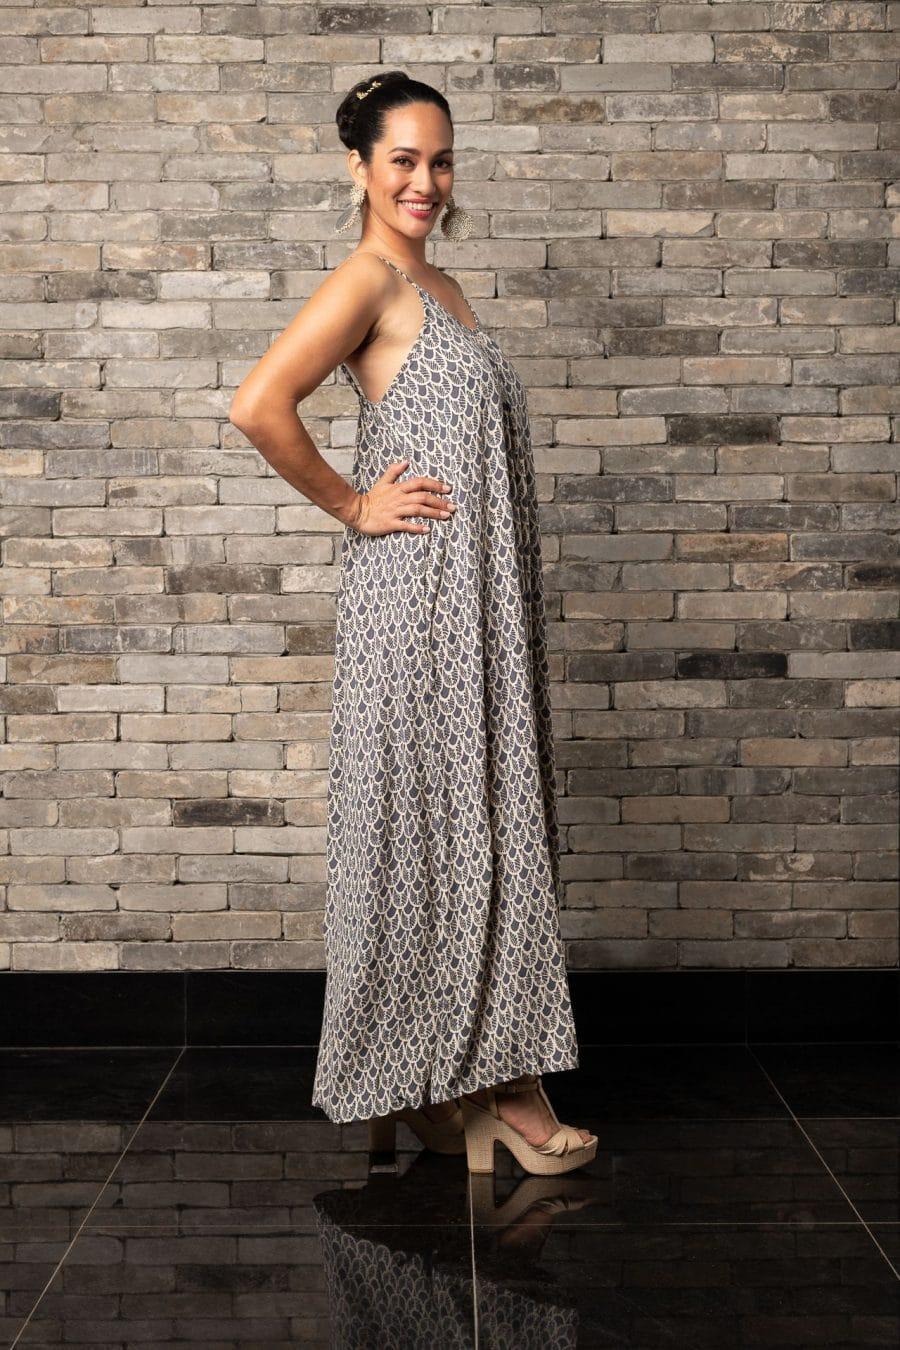 Model wearing Lei Dress in Pavement Moonbeam Palulu Pattern - Side View